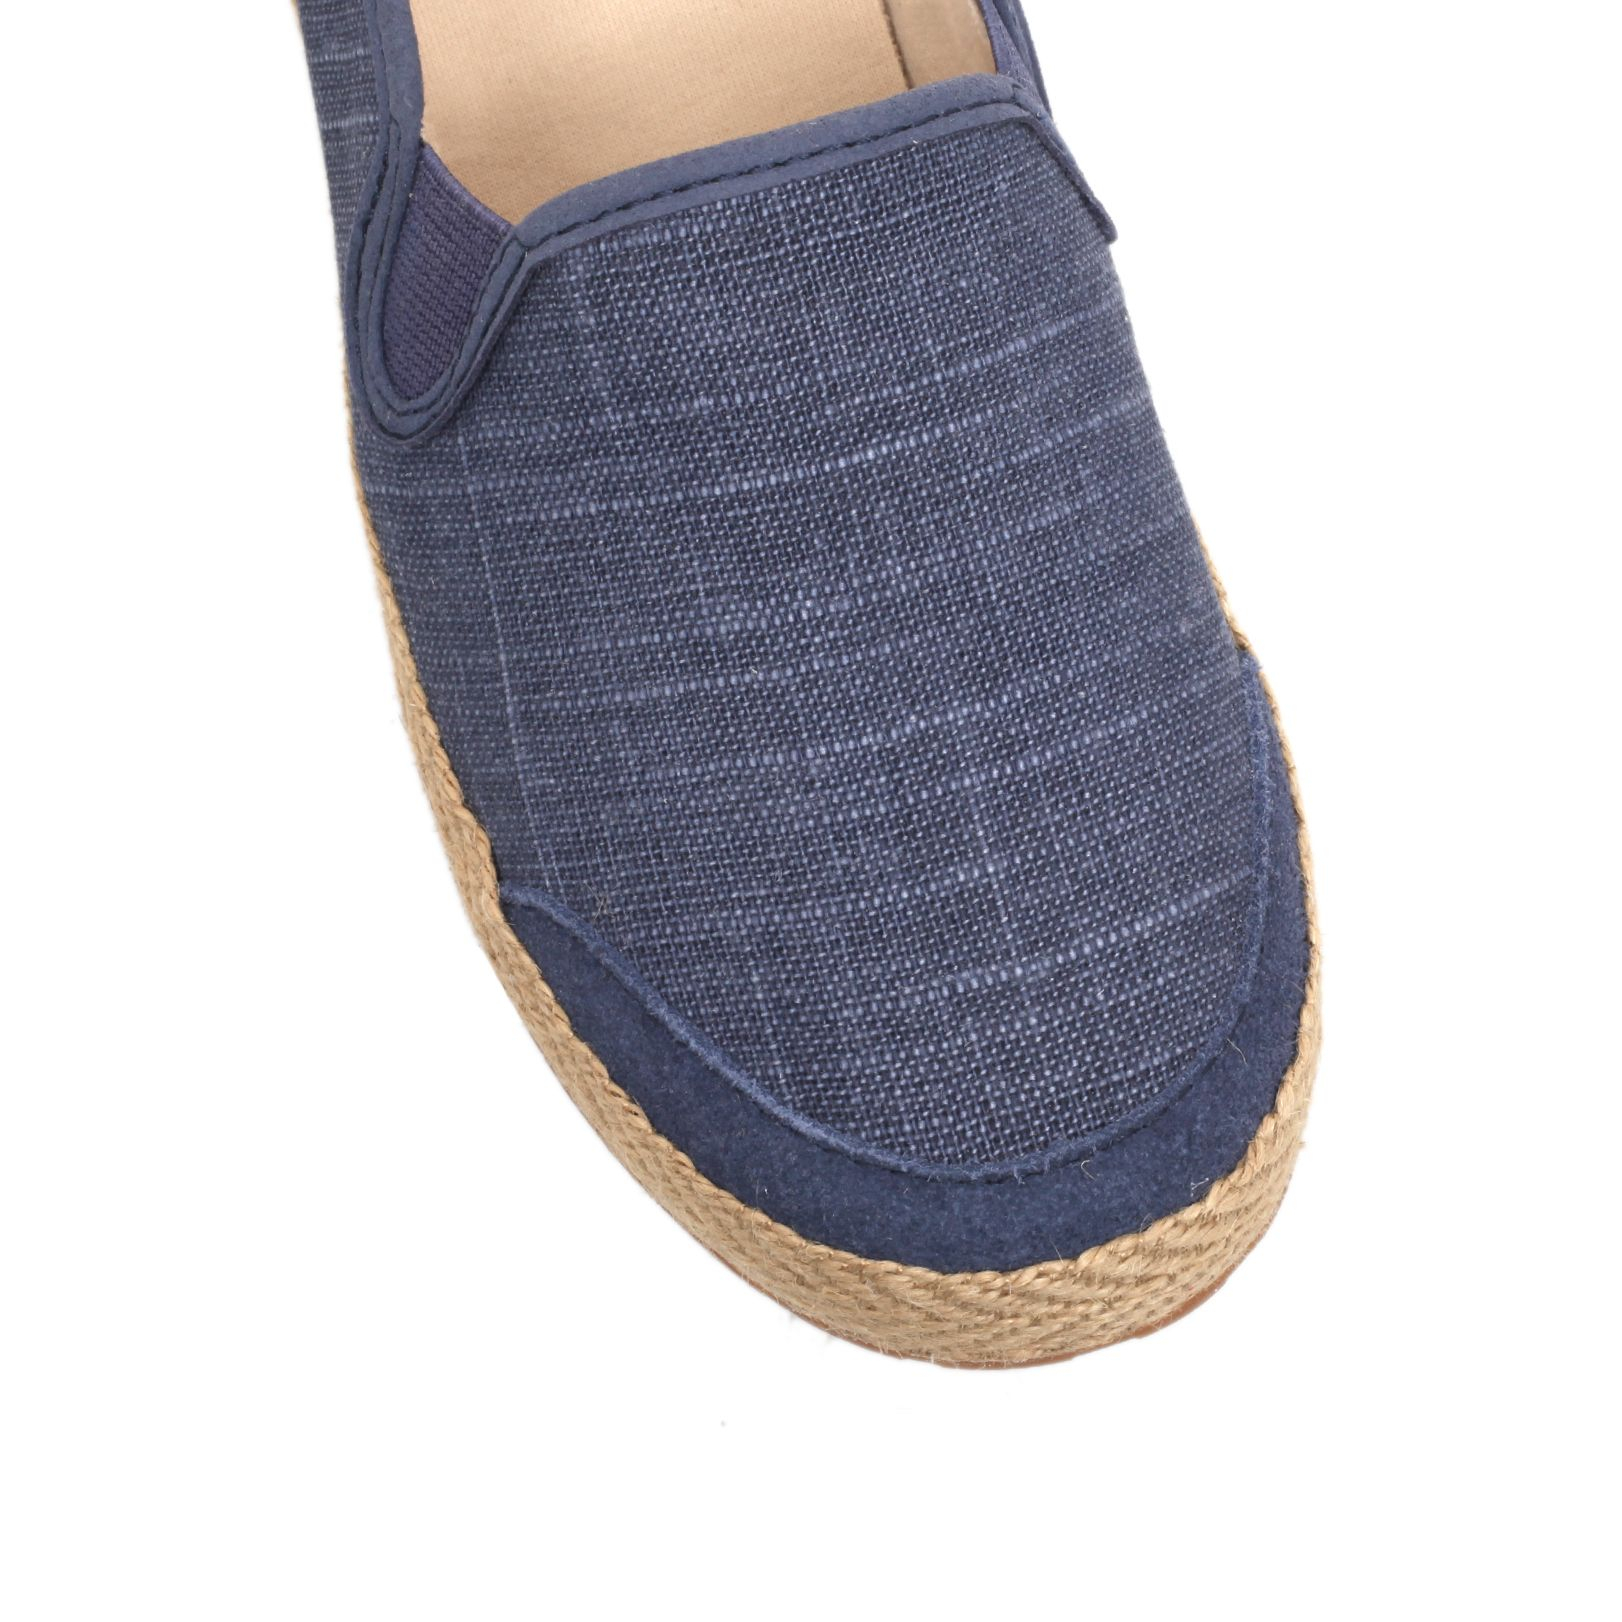 d2246b6cbf1 Ugg Boots Corrimal Nsw